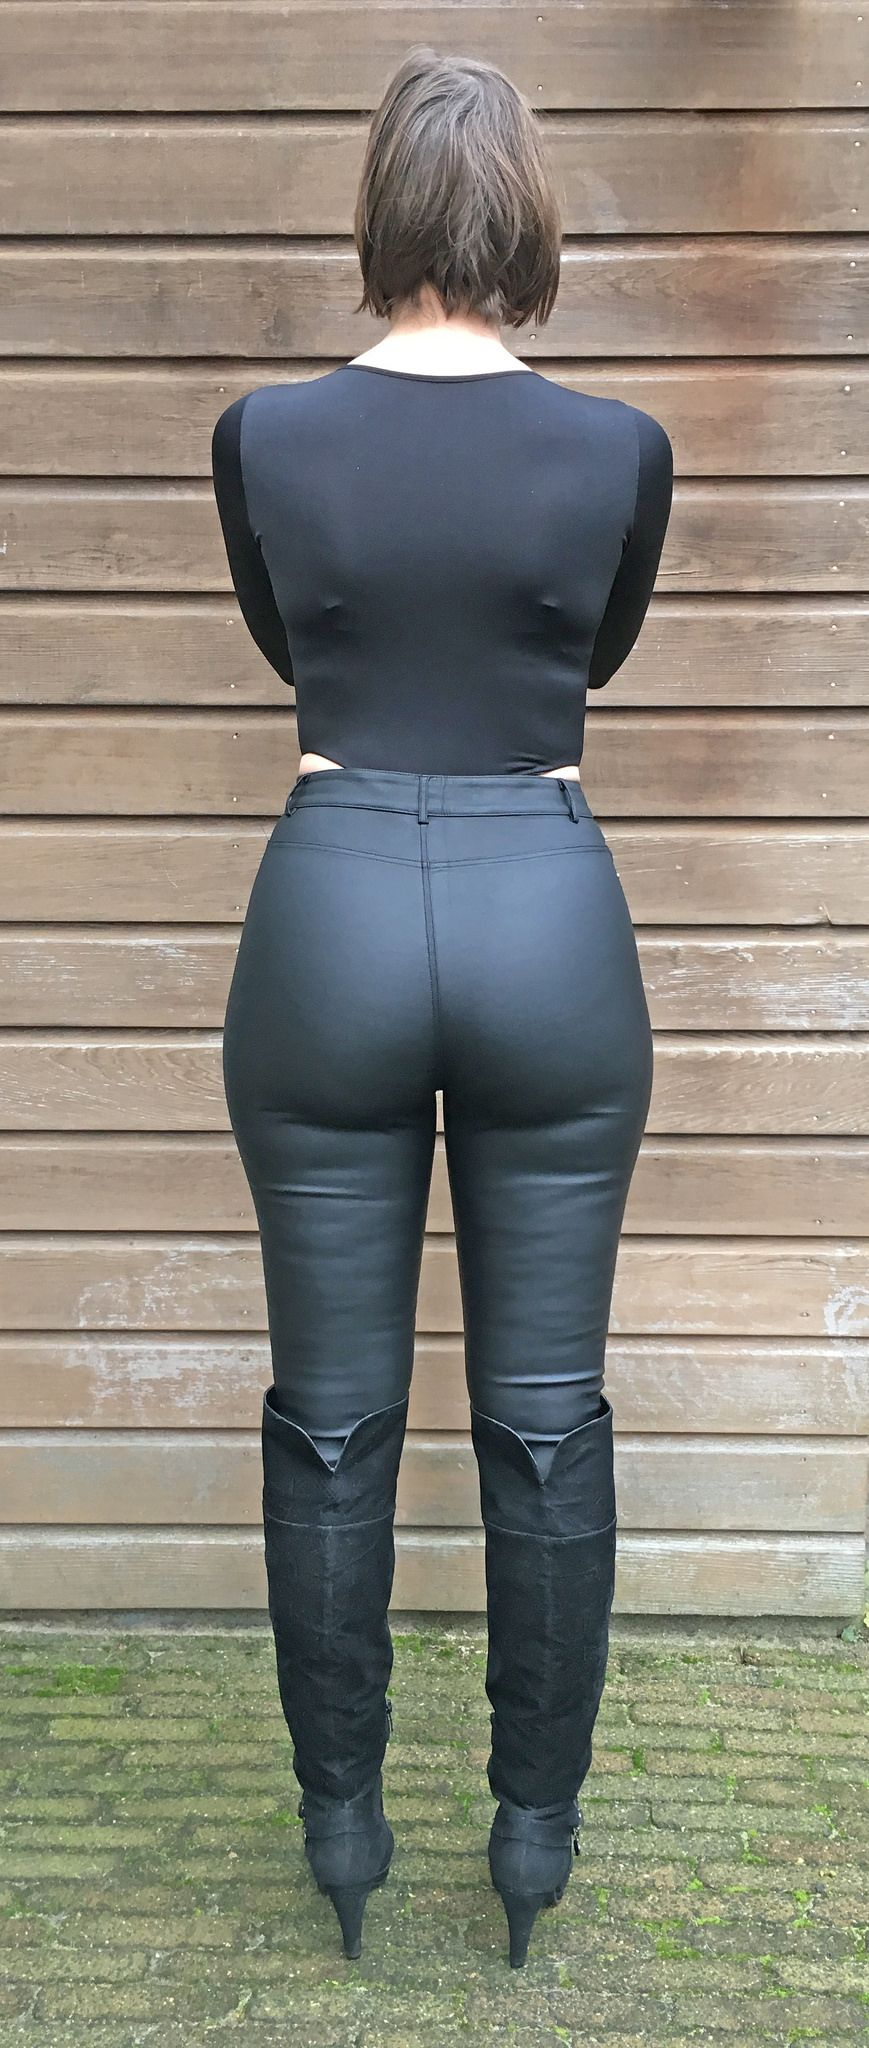 001 | crossdressers, nice asses and bodysuit